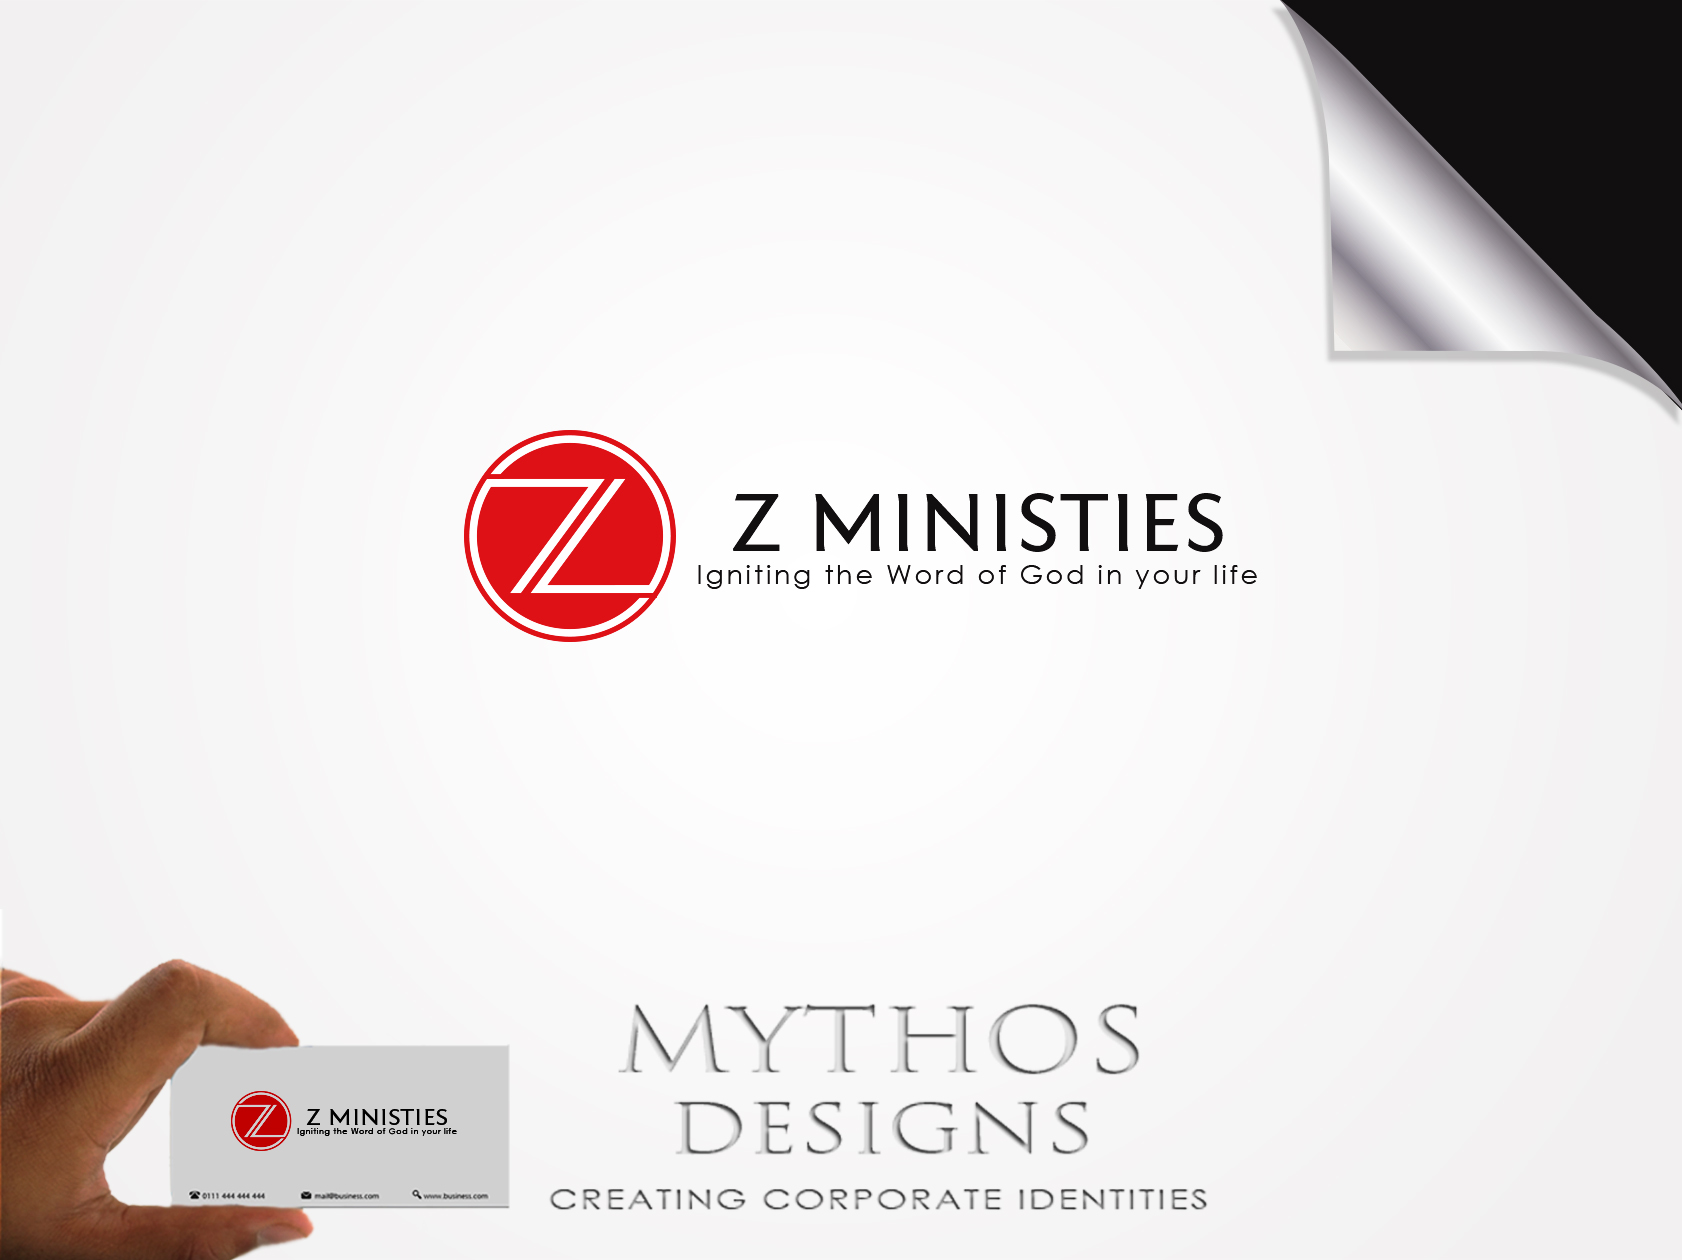 Logo Design by Mythos Designs - Entry No. 137 in the Logo Design Contest Artistic Logo Design for Z Ministries.